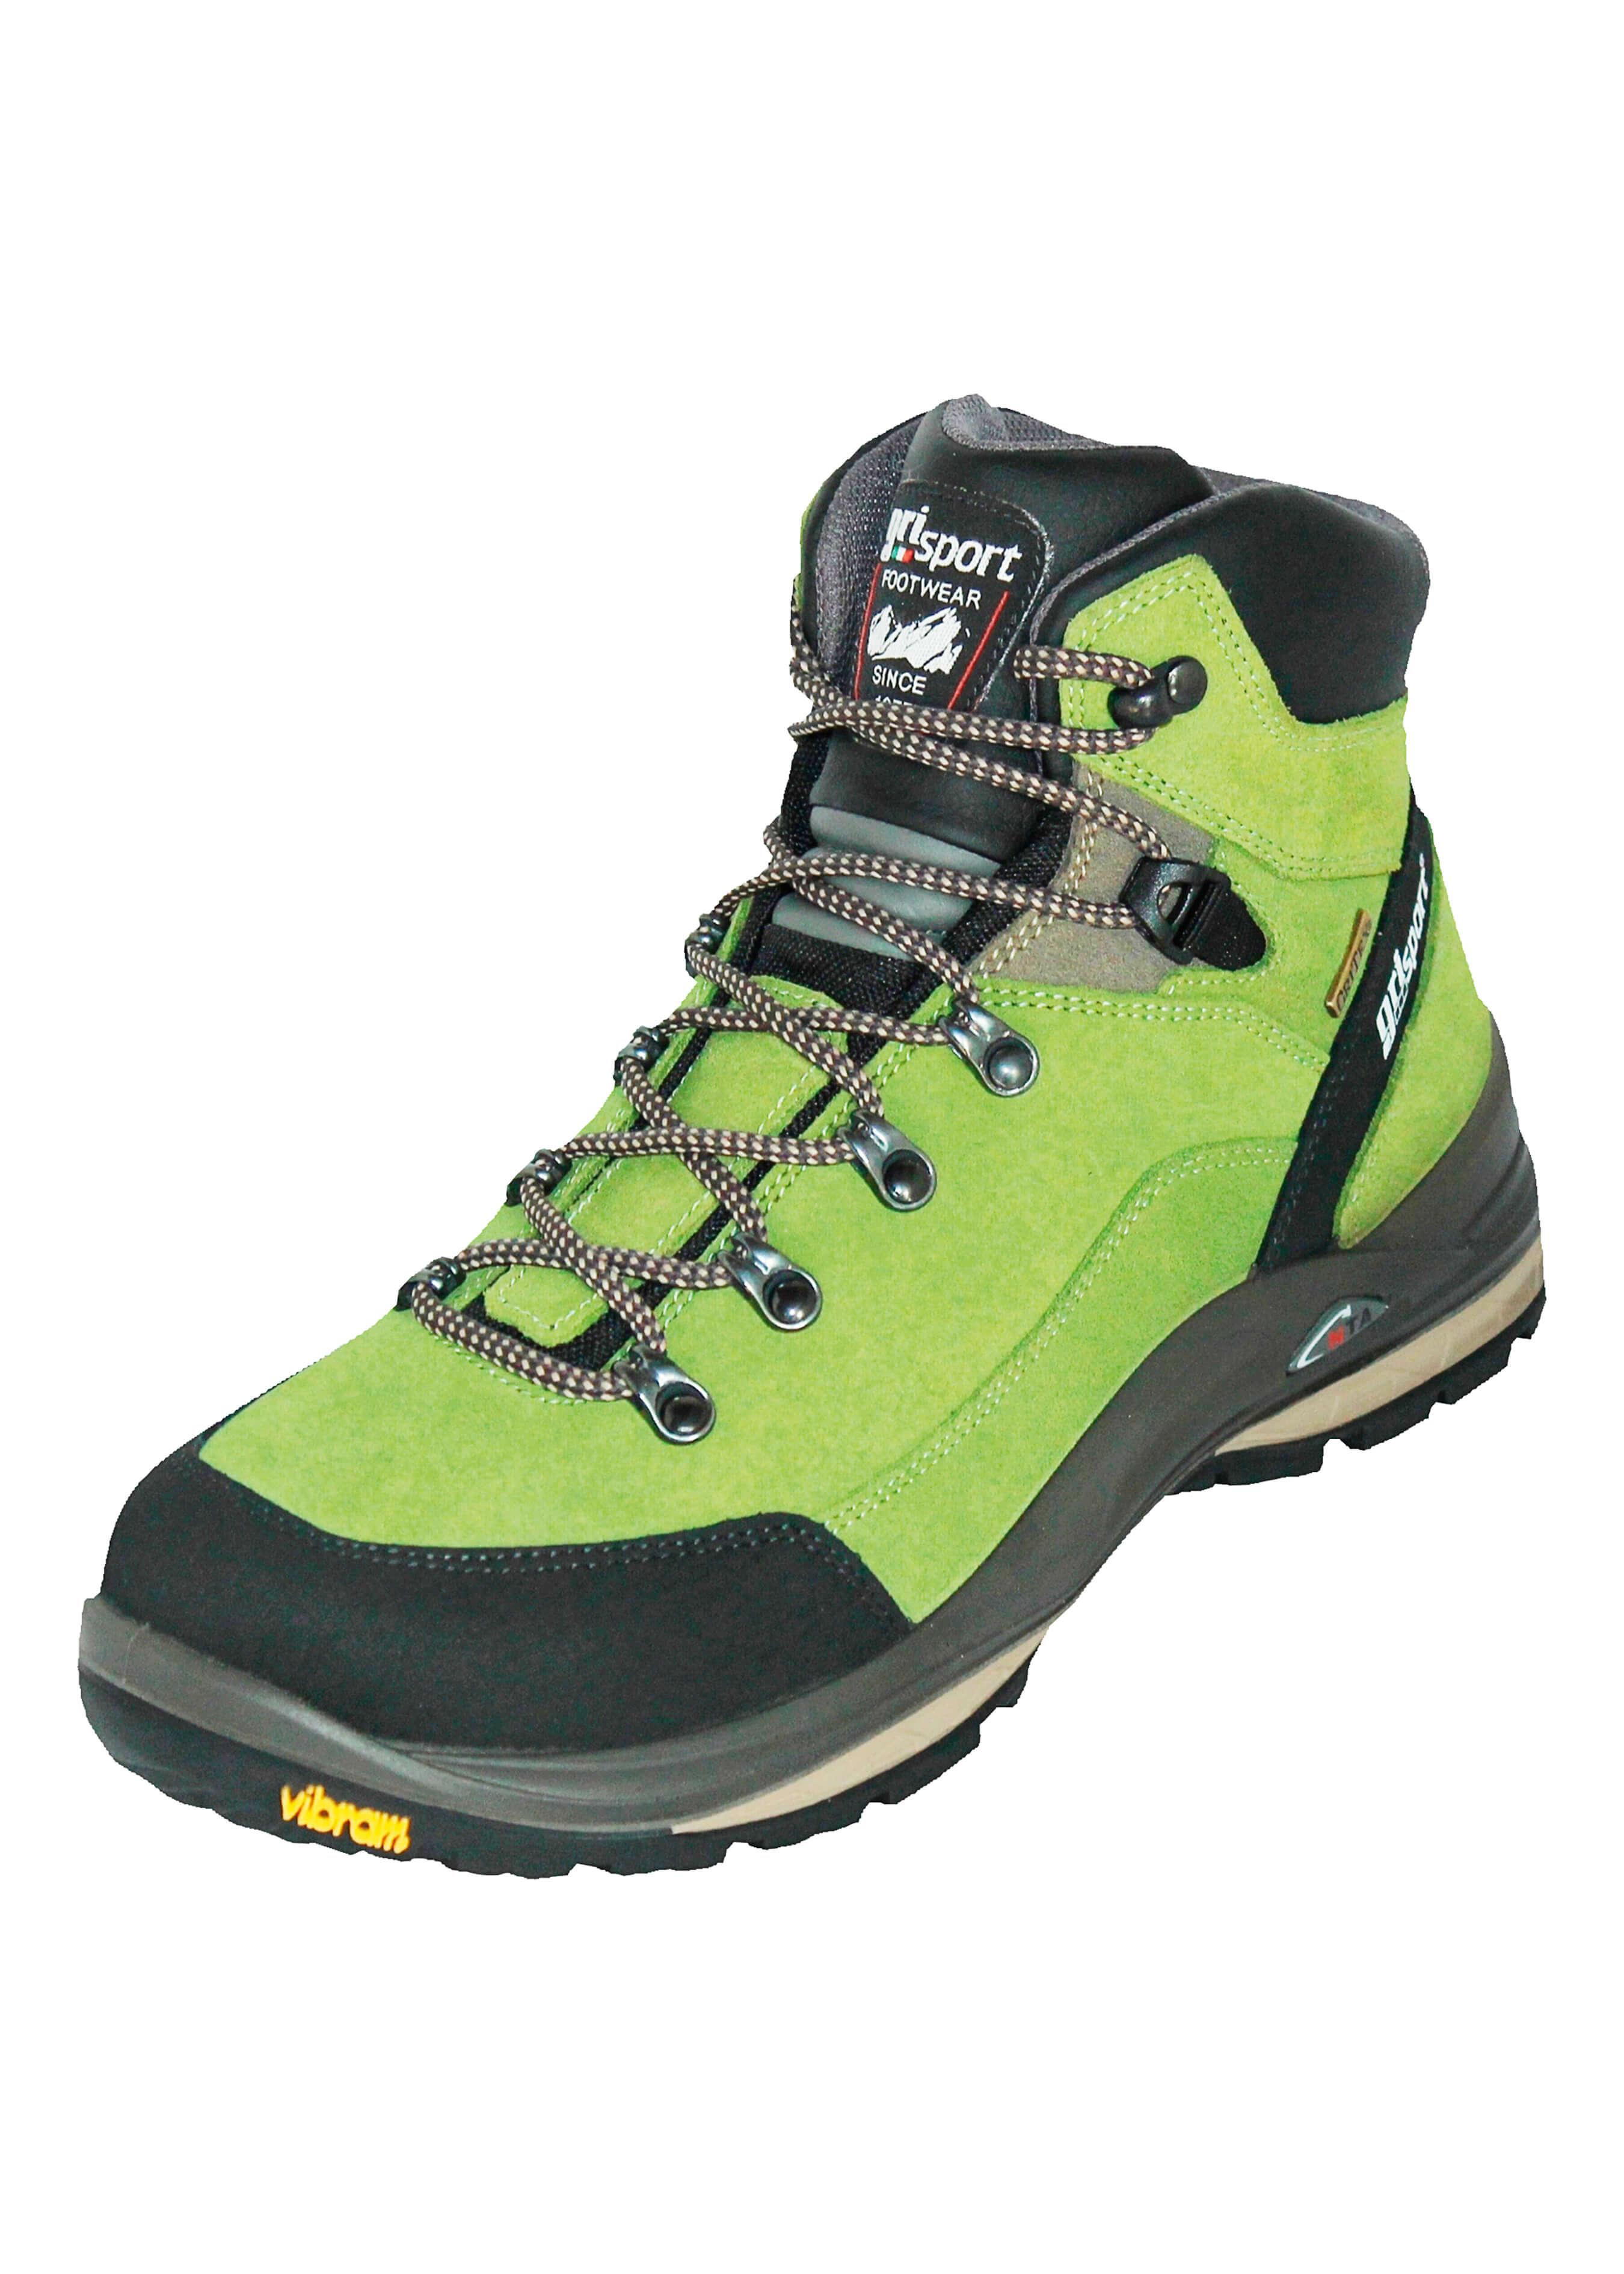 Chaussure de trekking en cuir nubuck 40042336 1